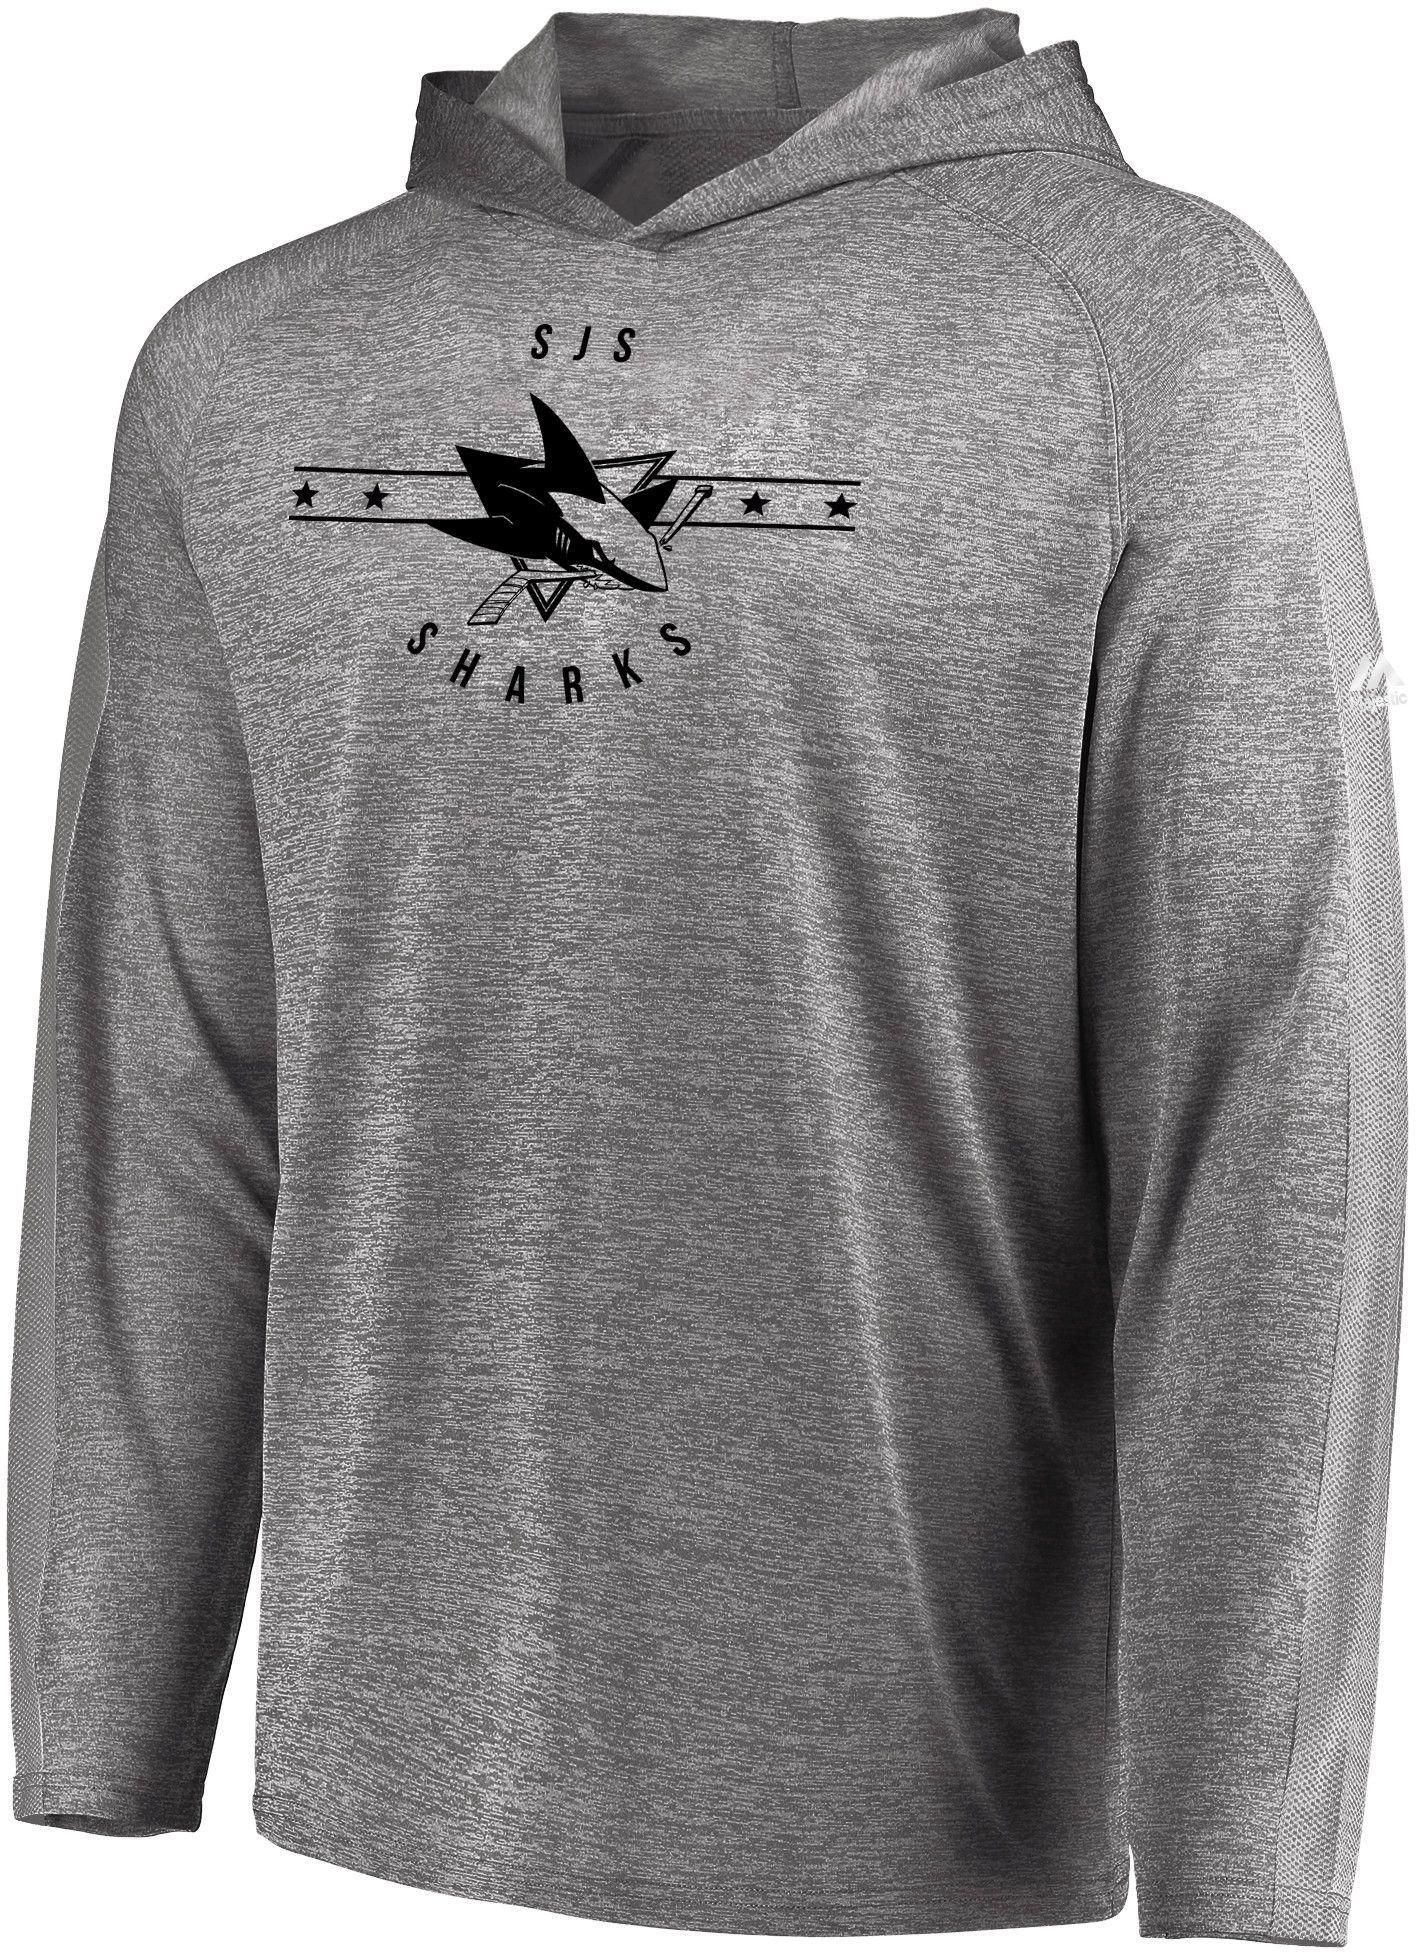 S San Jose Sharks Fan Flow Heather Grey Smal Shirts